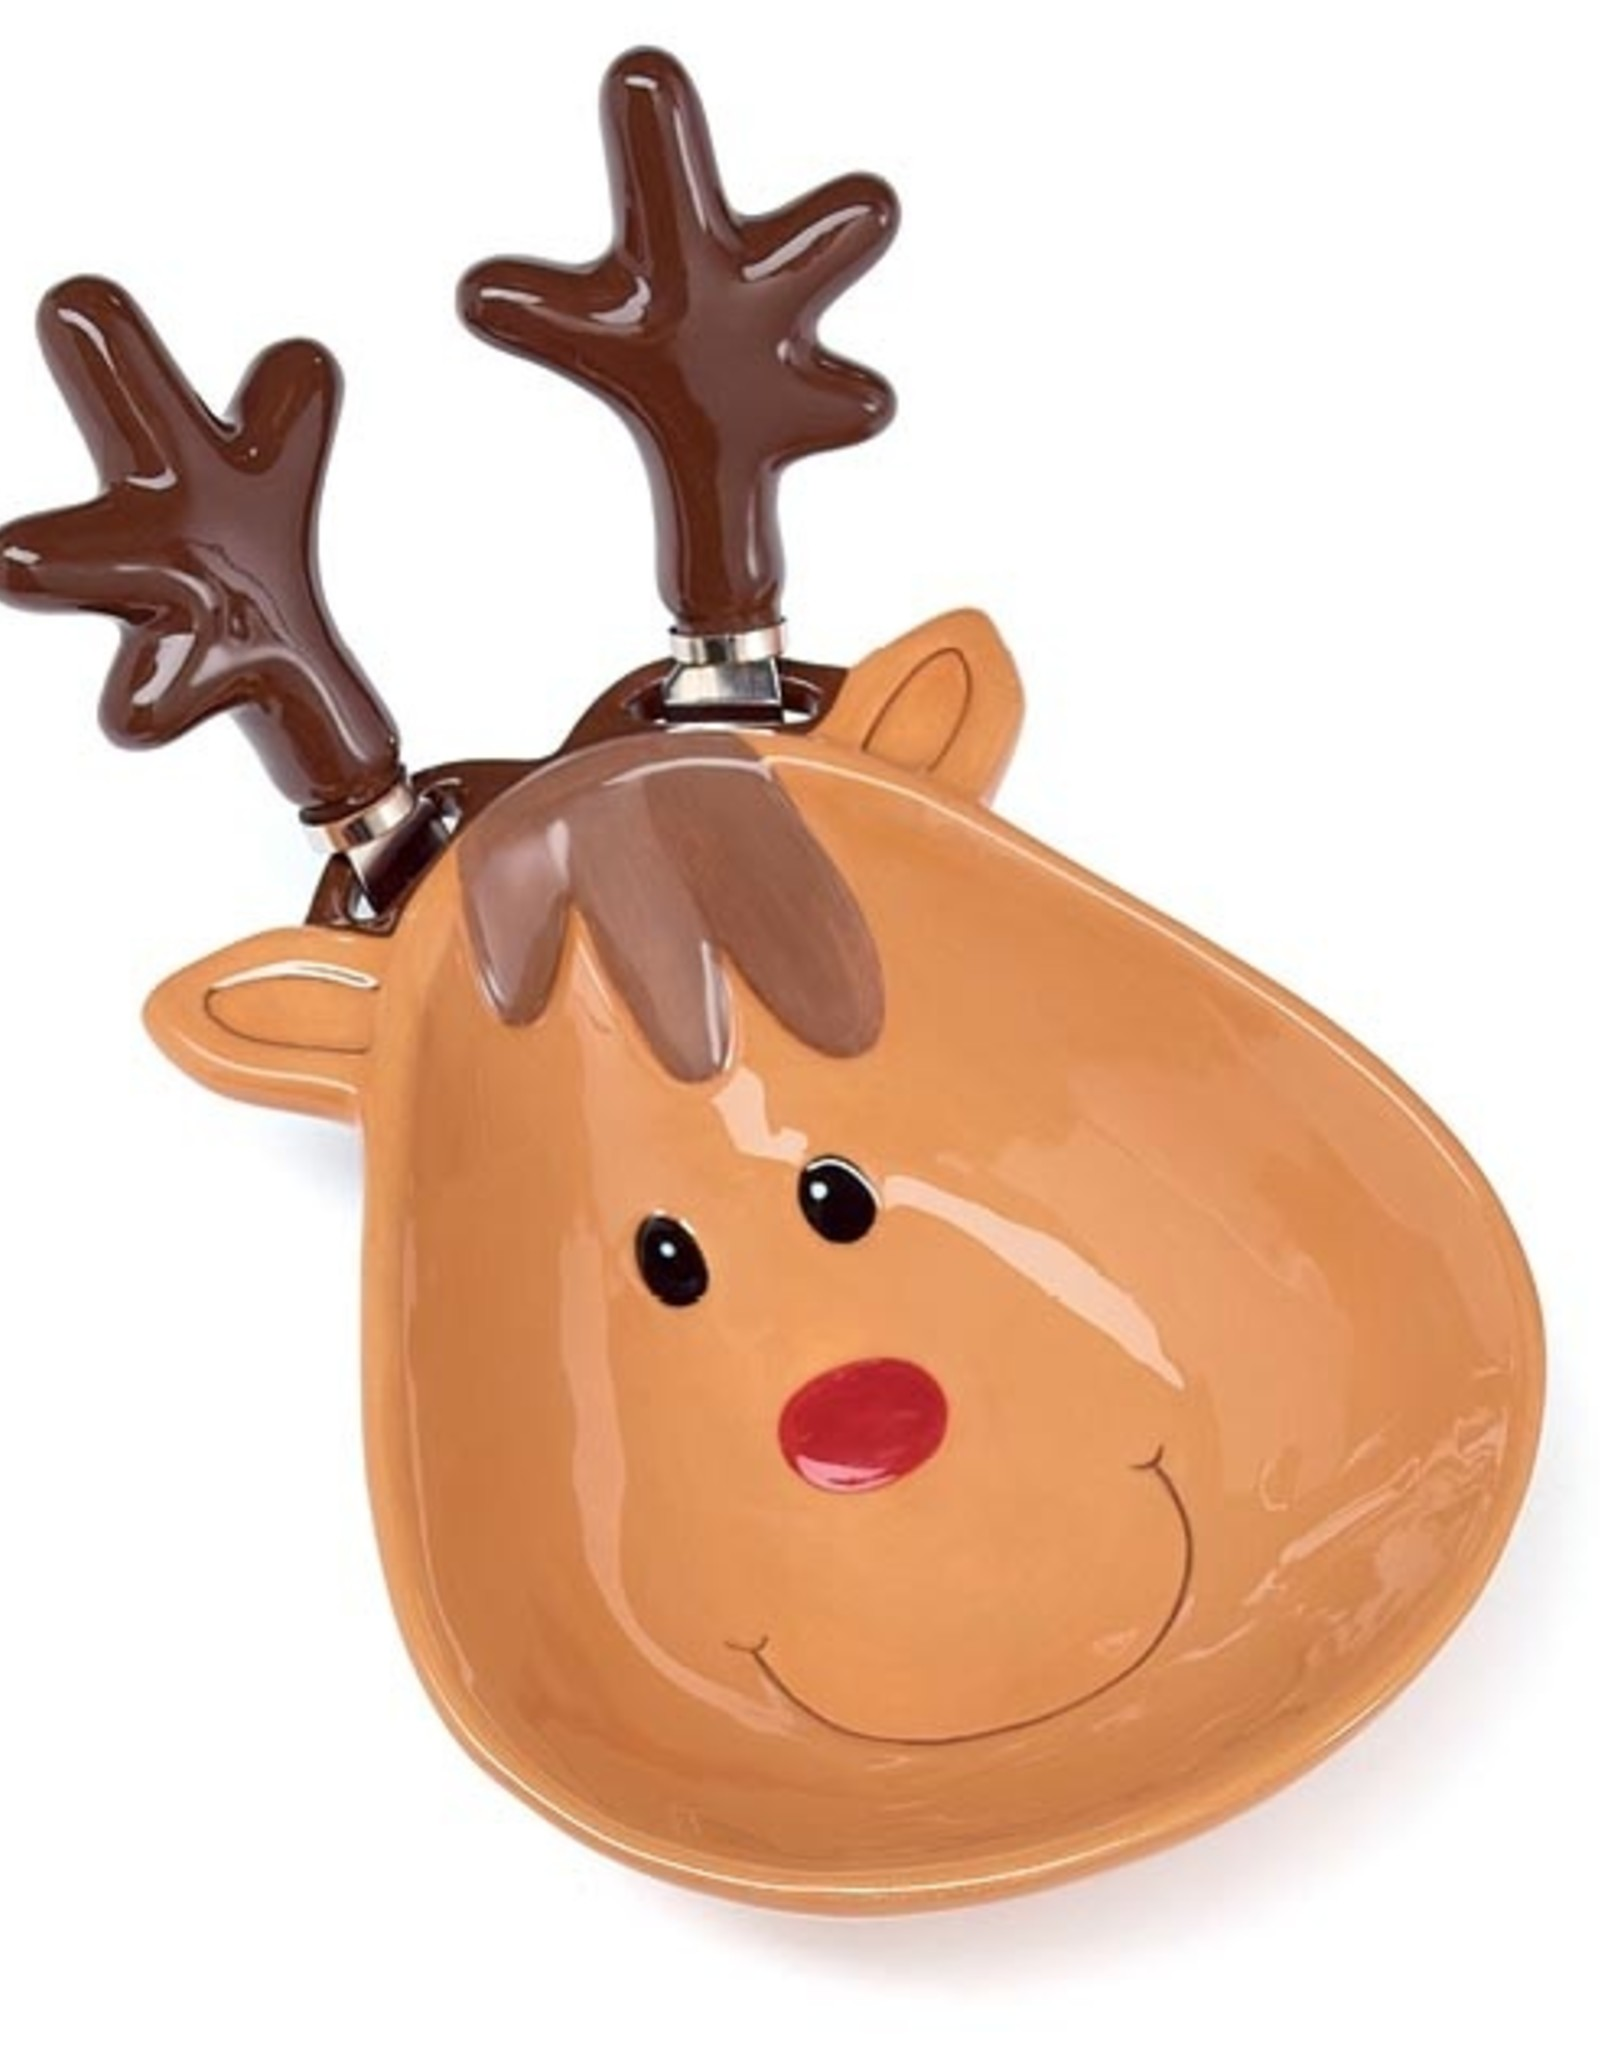 Wink Reindeer Spreader